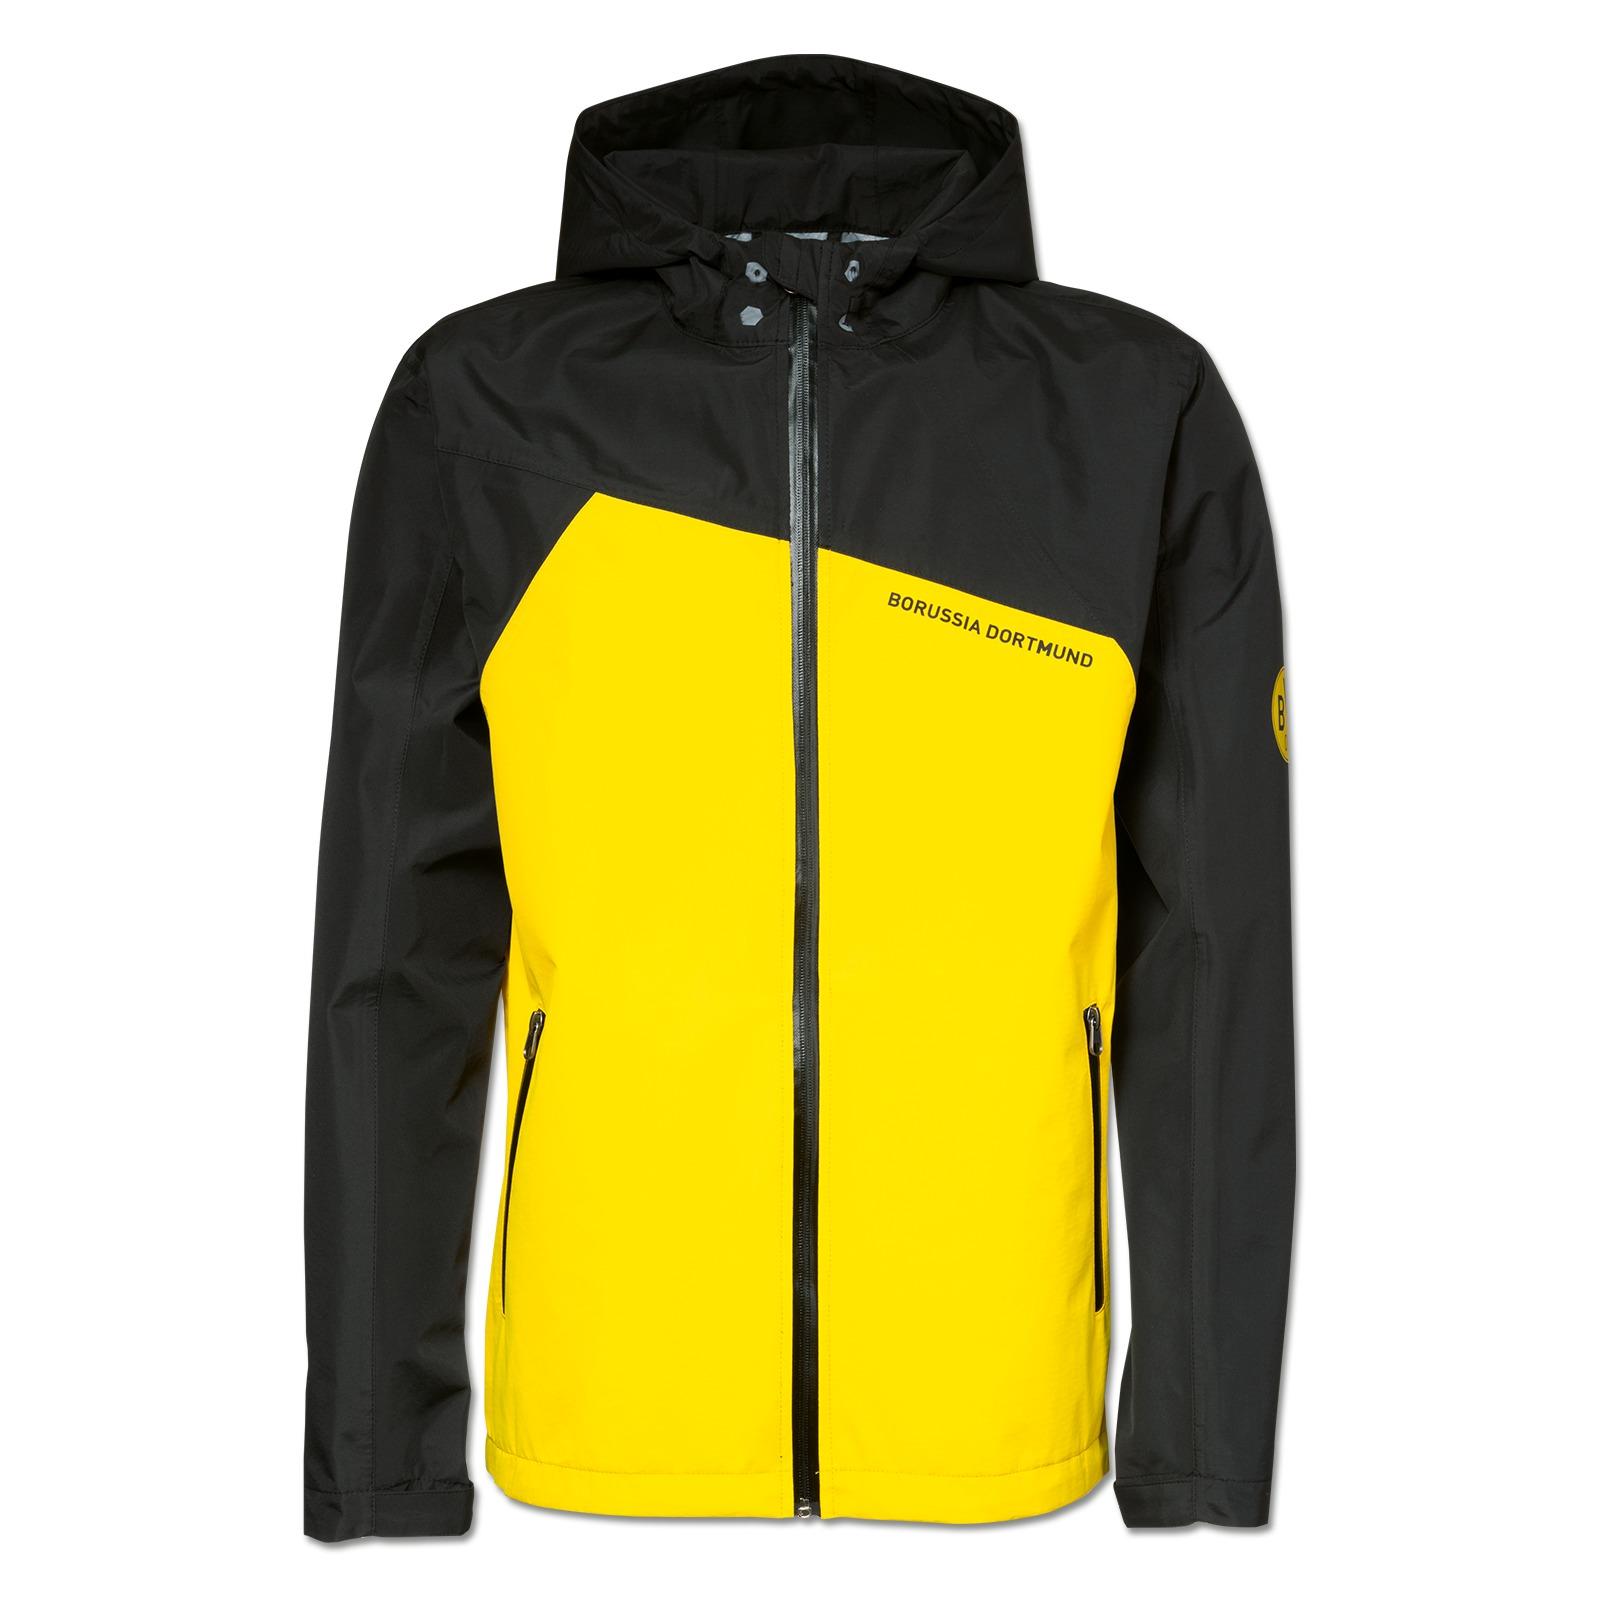 Bvb Rain Jacket For Kids Kids Apparel Bvb Onlineshop